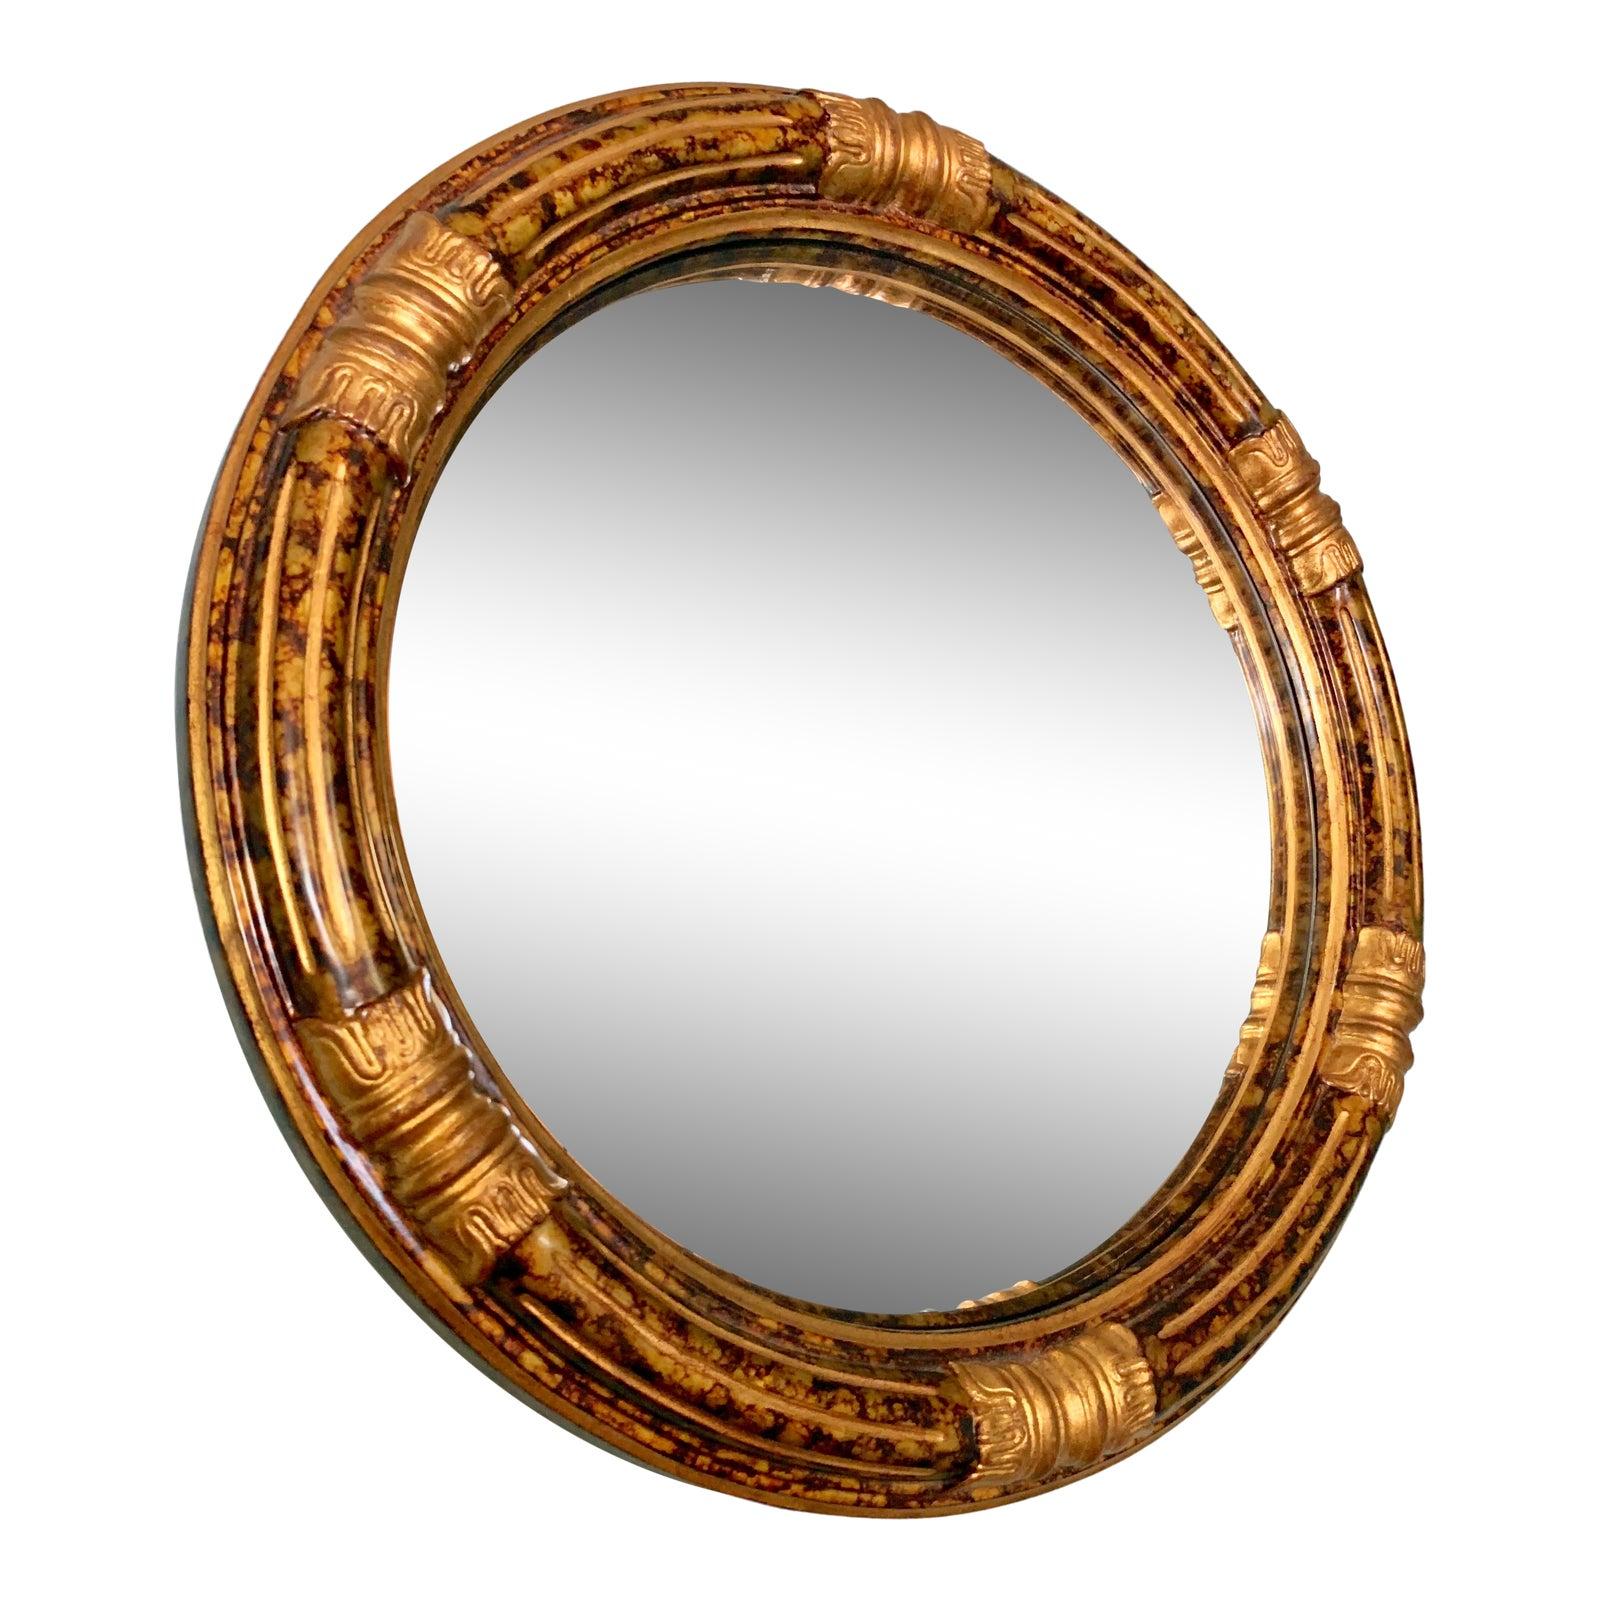 maitland-smith-convex-mirror-4619.jpeg